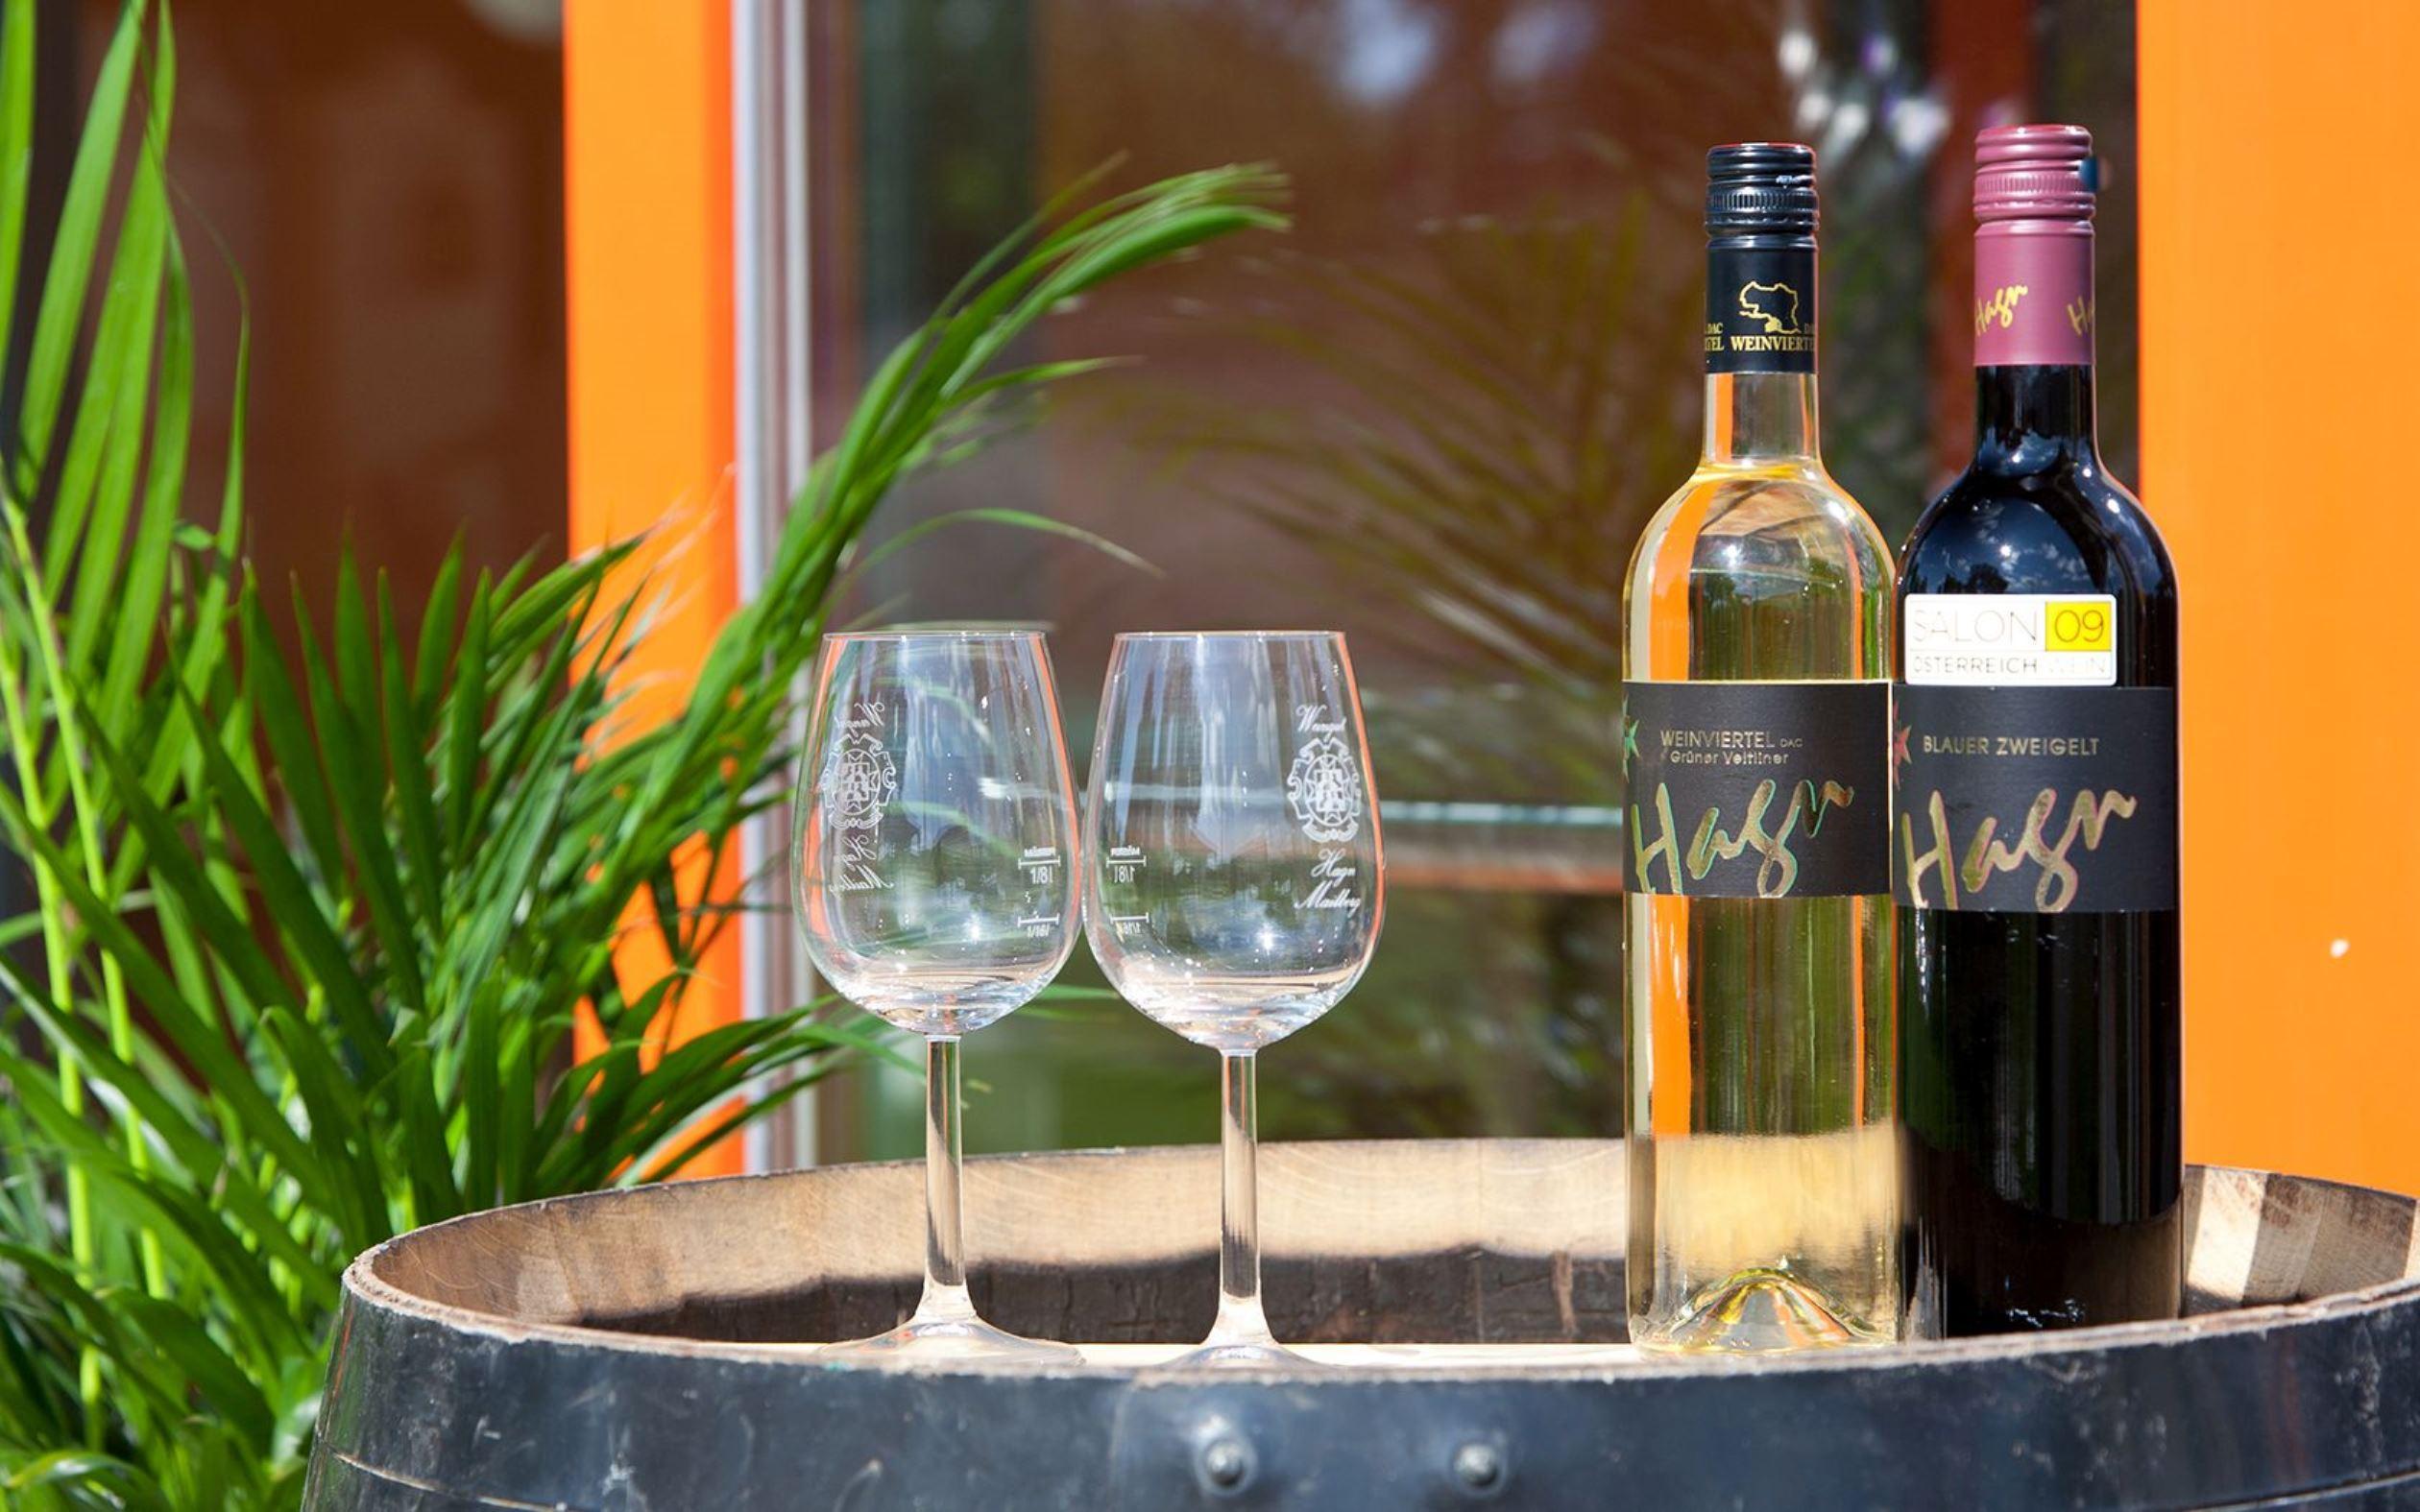 Hotel Jufa Weinviertel